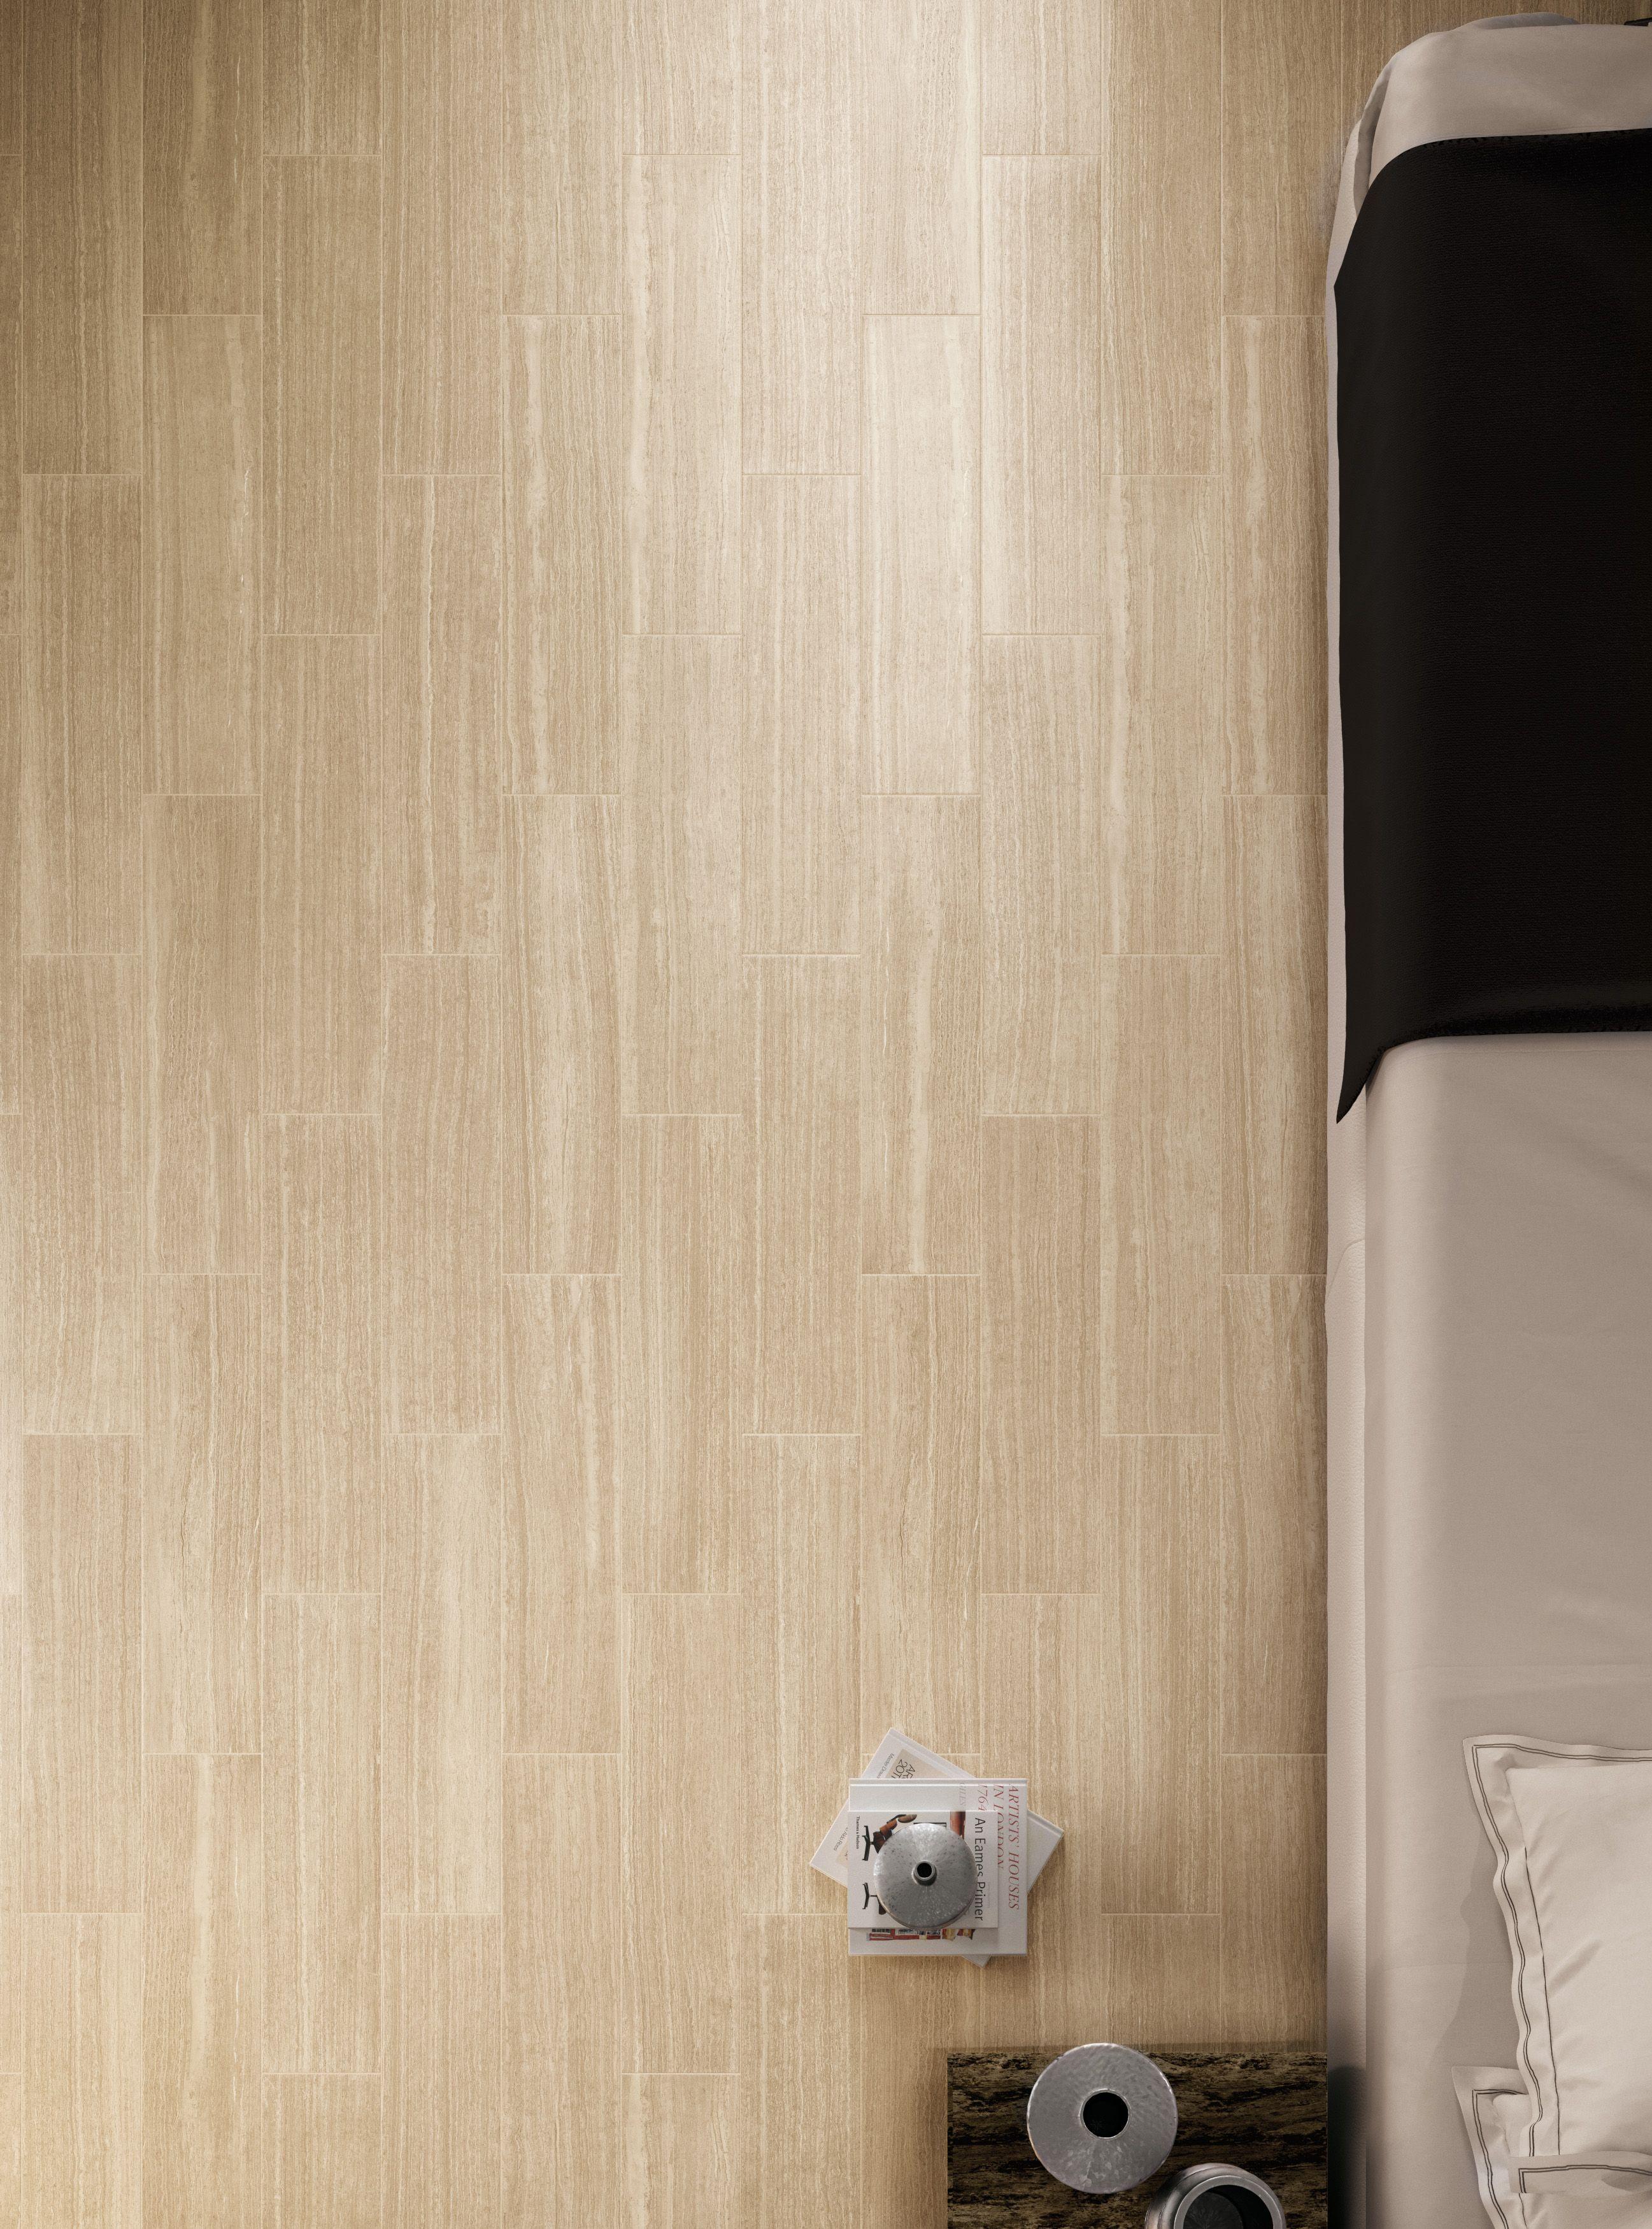 Subtle limestone plank flooring look with times beige 6x24 subtle limestone plank flooring look with times beige 6x24 porcelain tile floortile dailygadgetfo Gallery